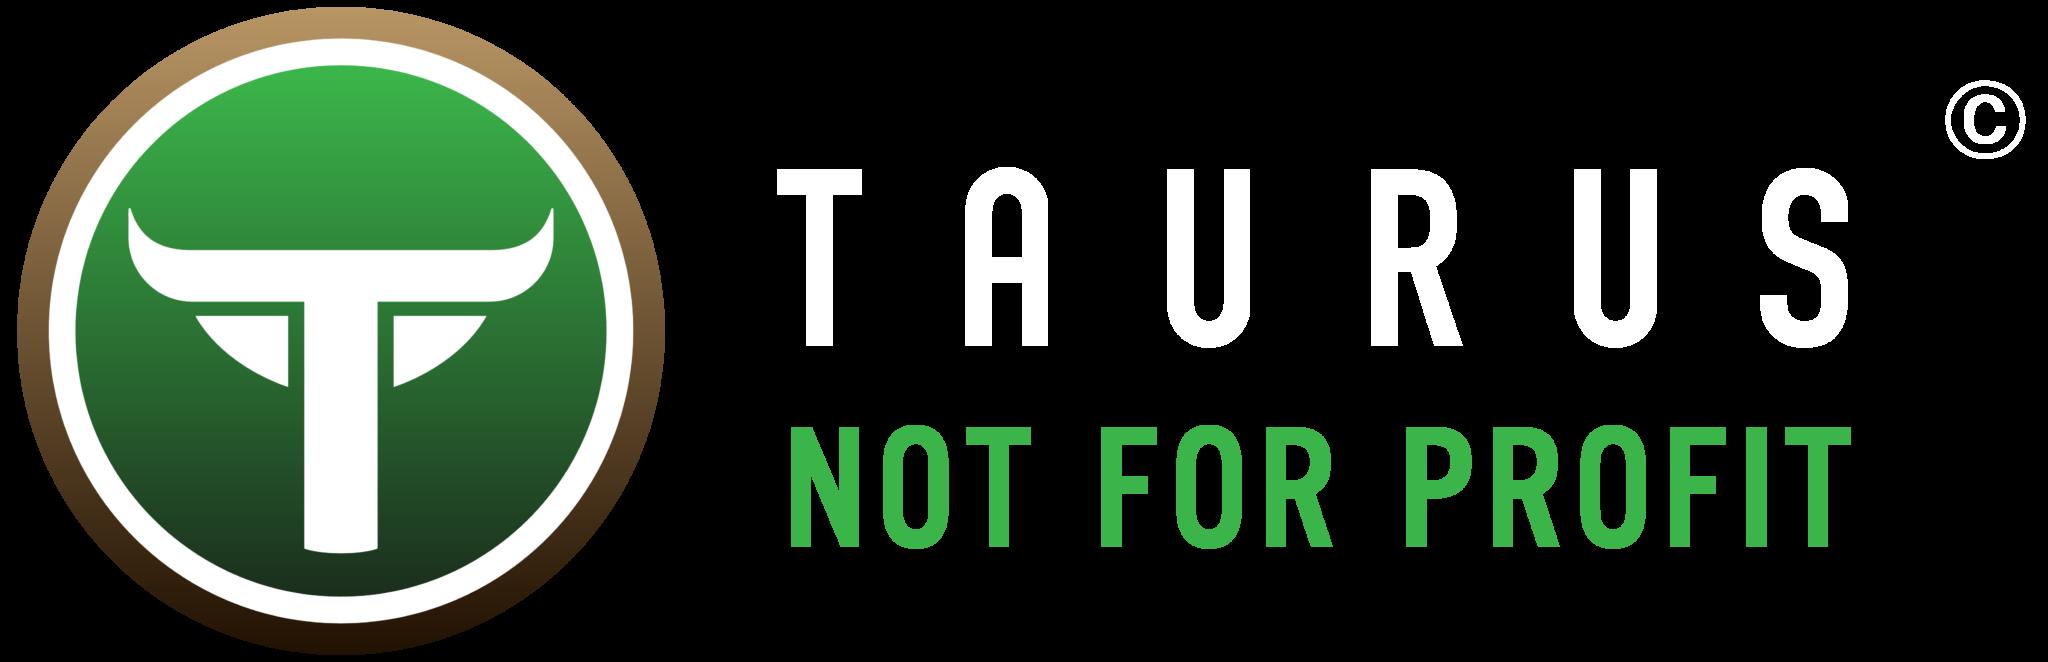 TaurusNFP Horizontal White